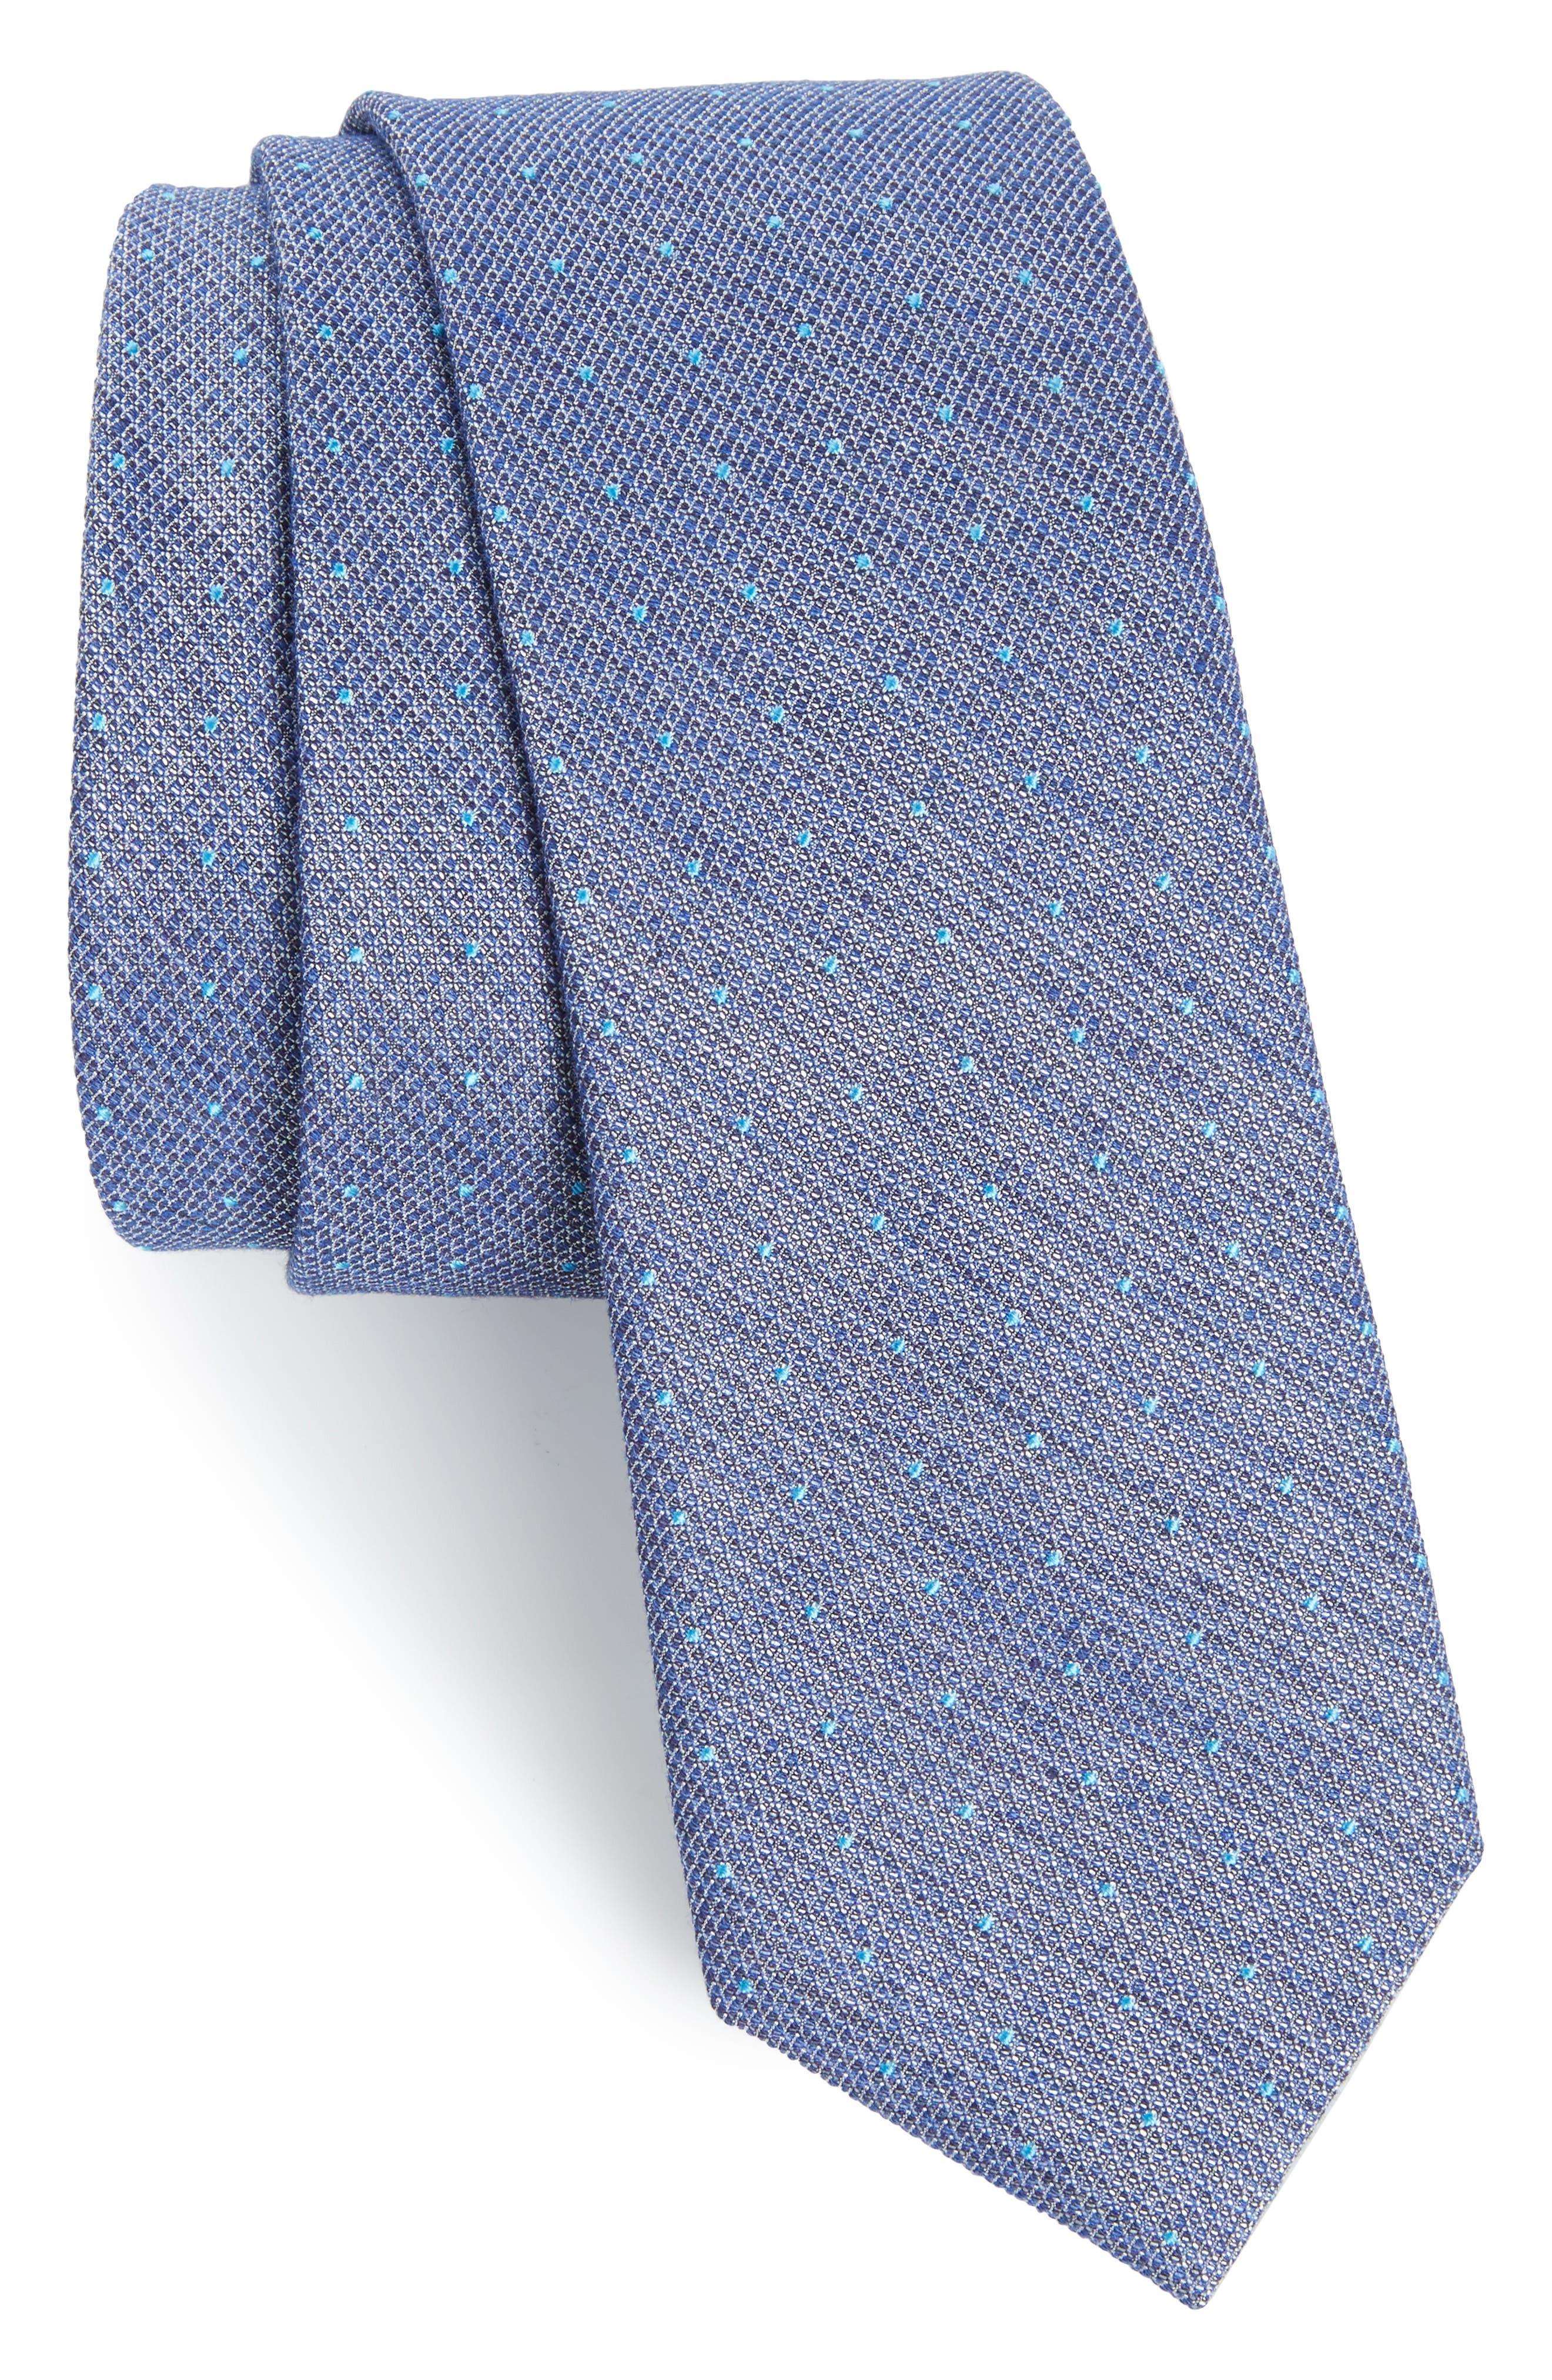 Dot Silk Blend Skinny Tie,                             Main thumbnail 1, color,                             Aqua/ Teal